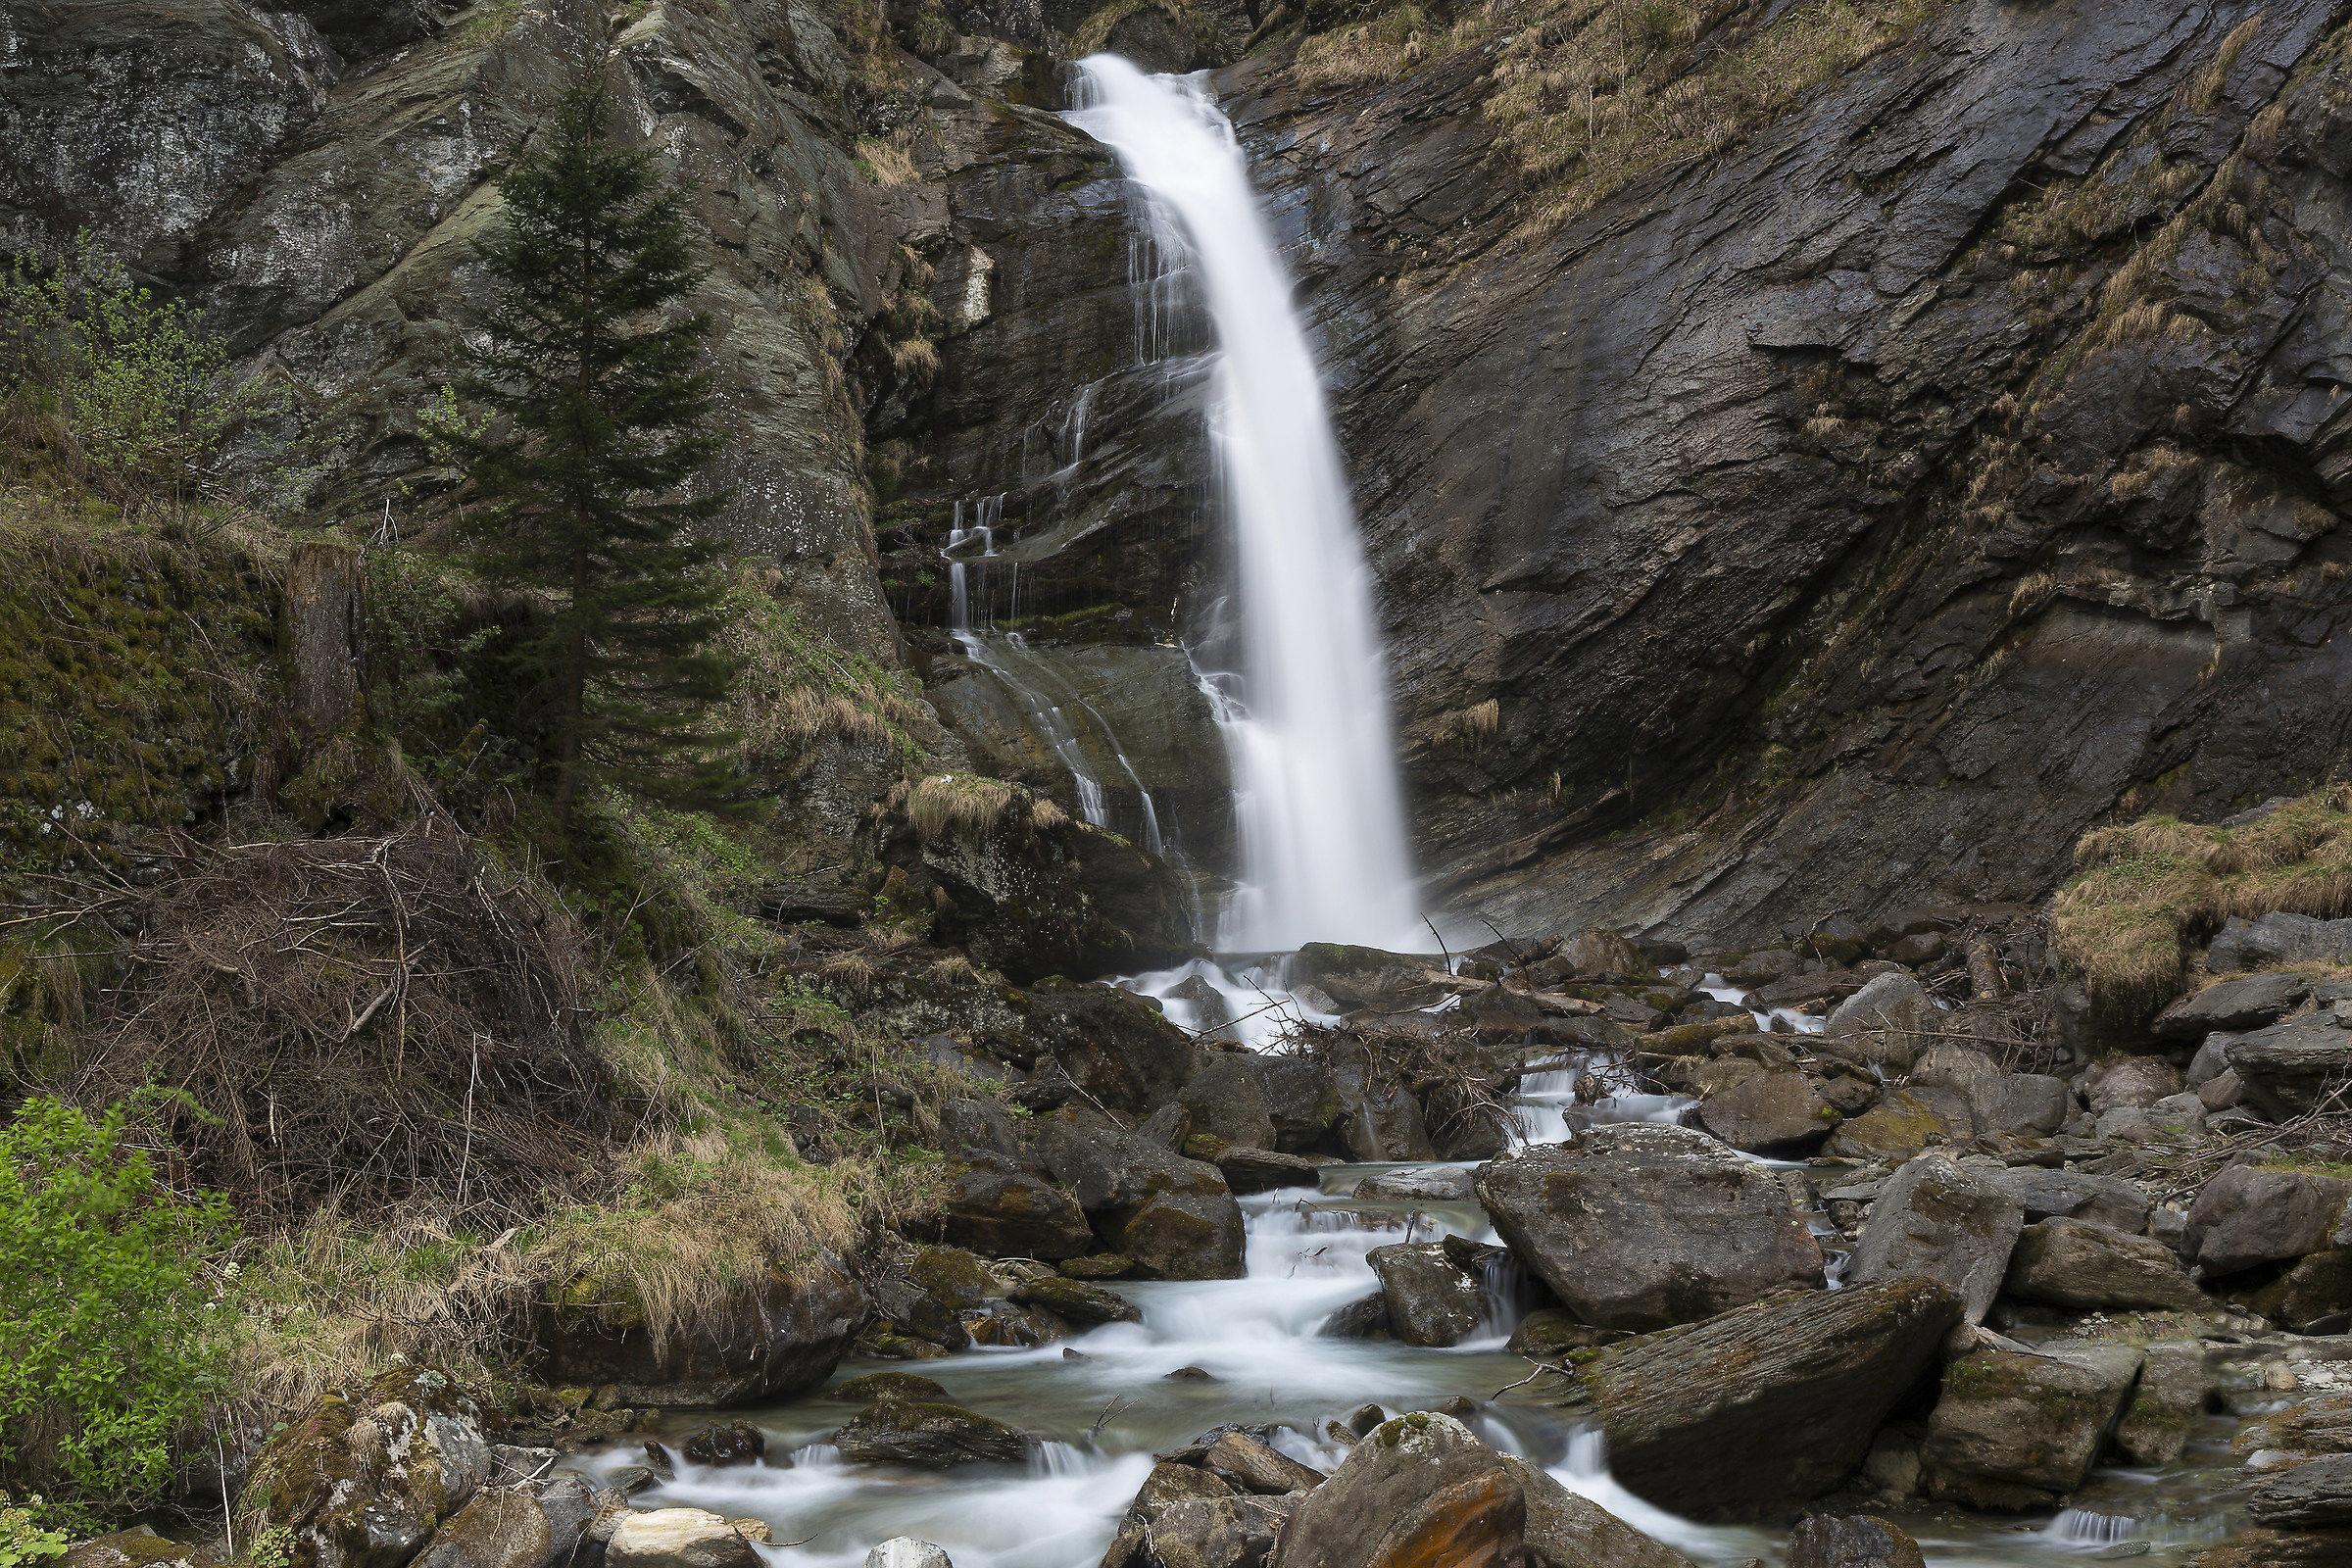 Waterfall of Otro (Valsesia)...